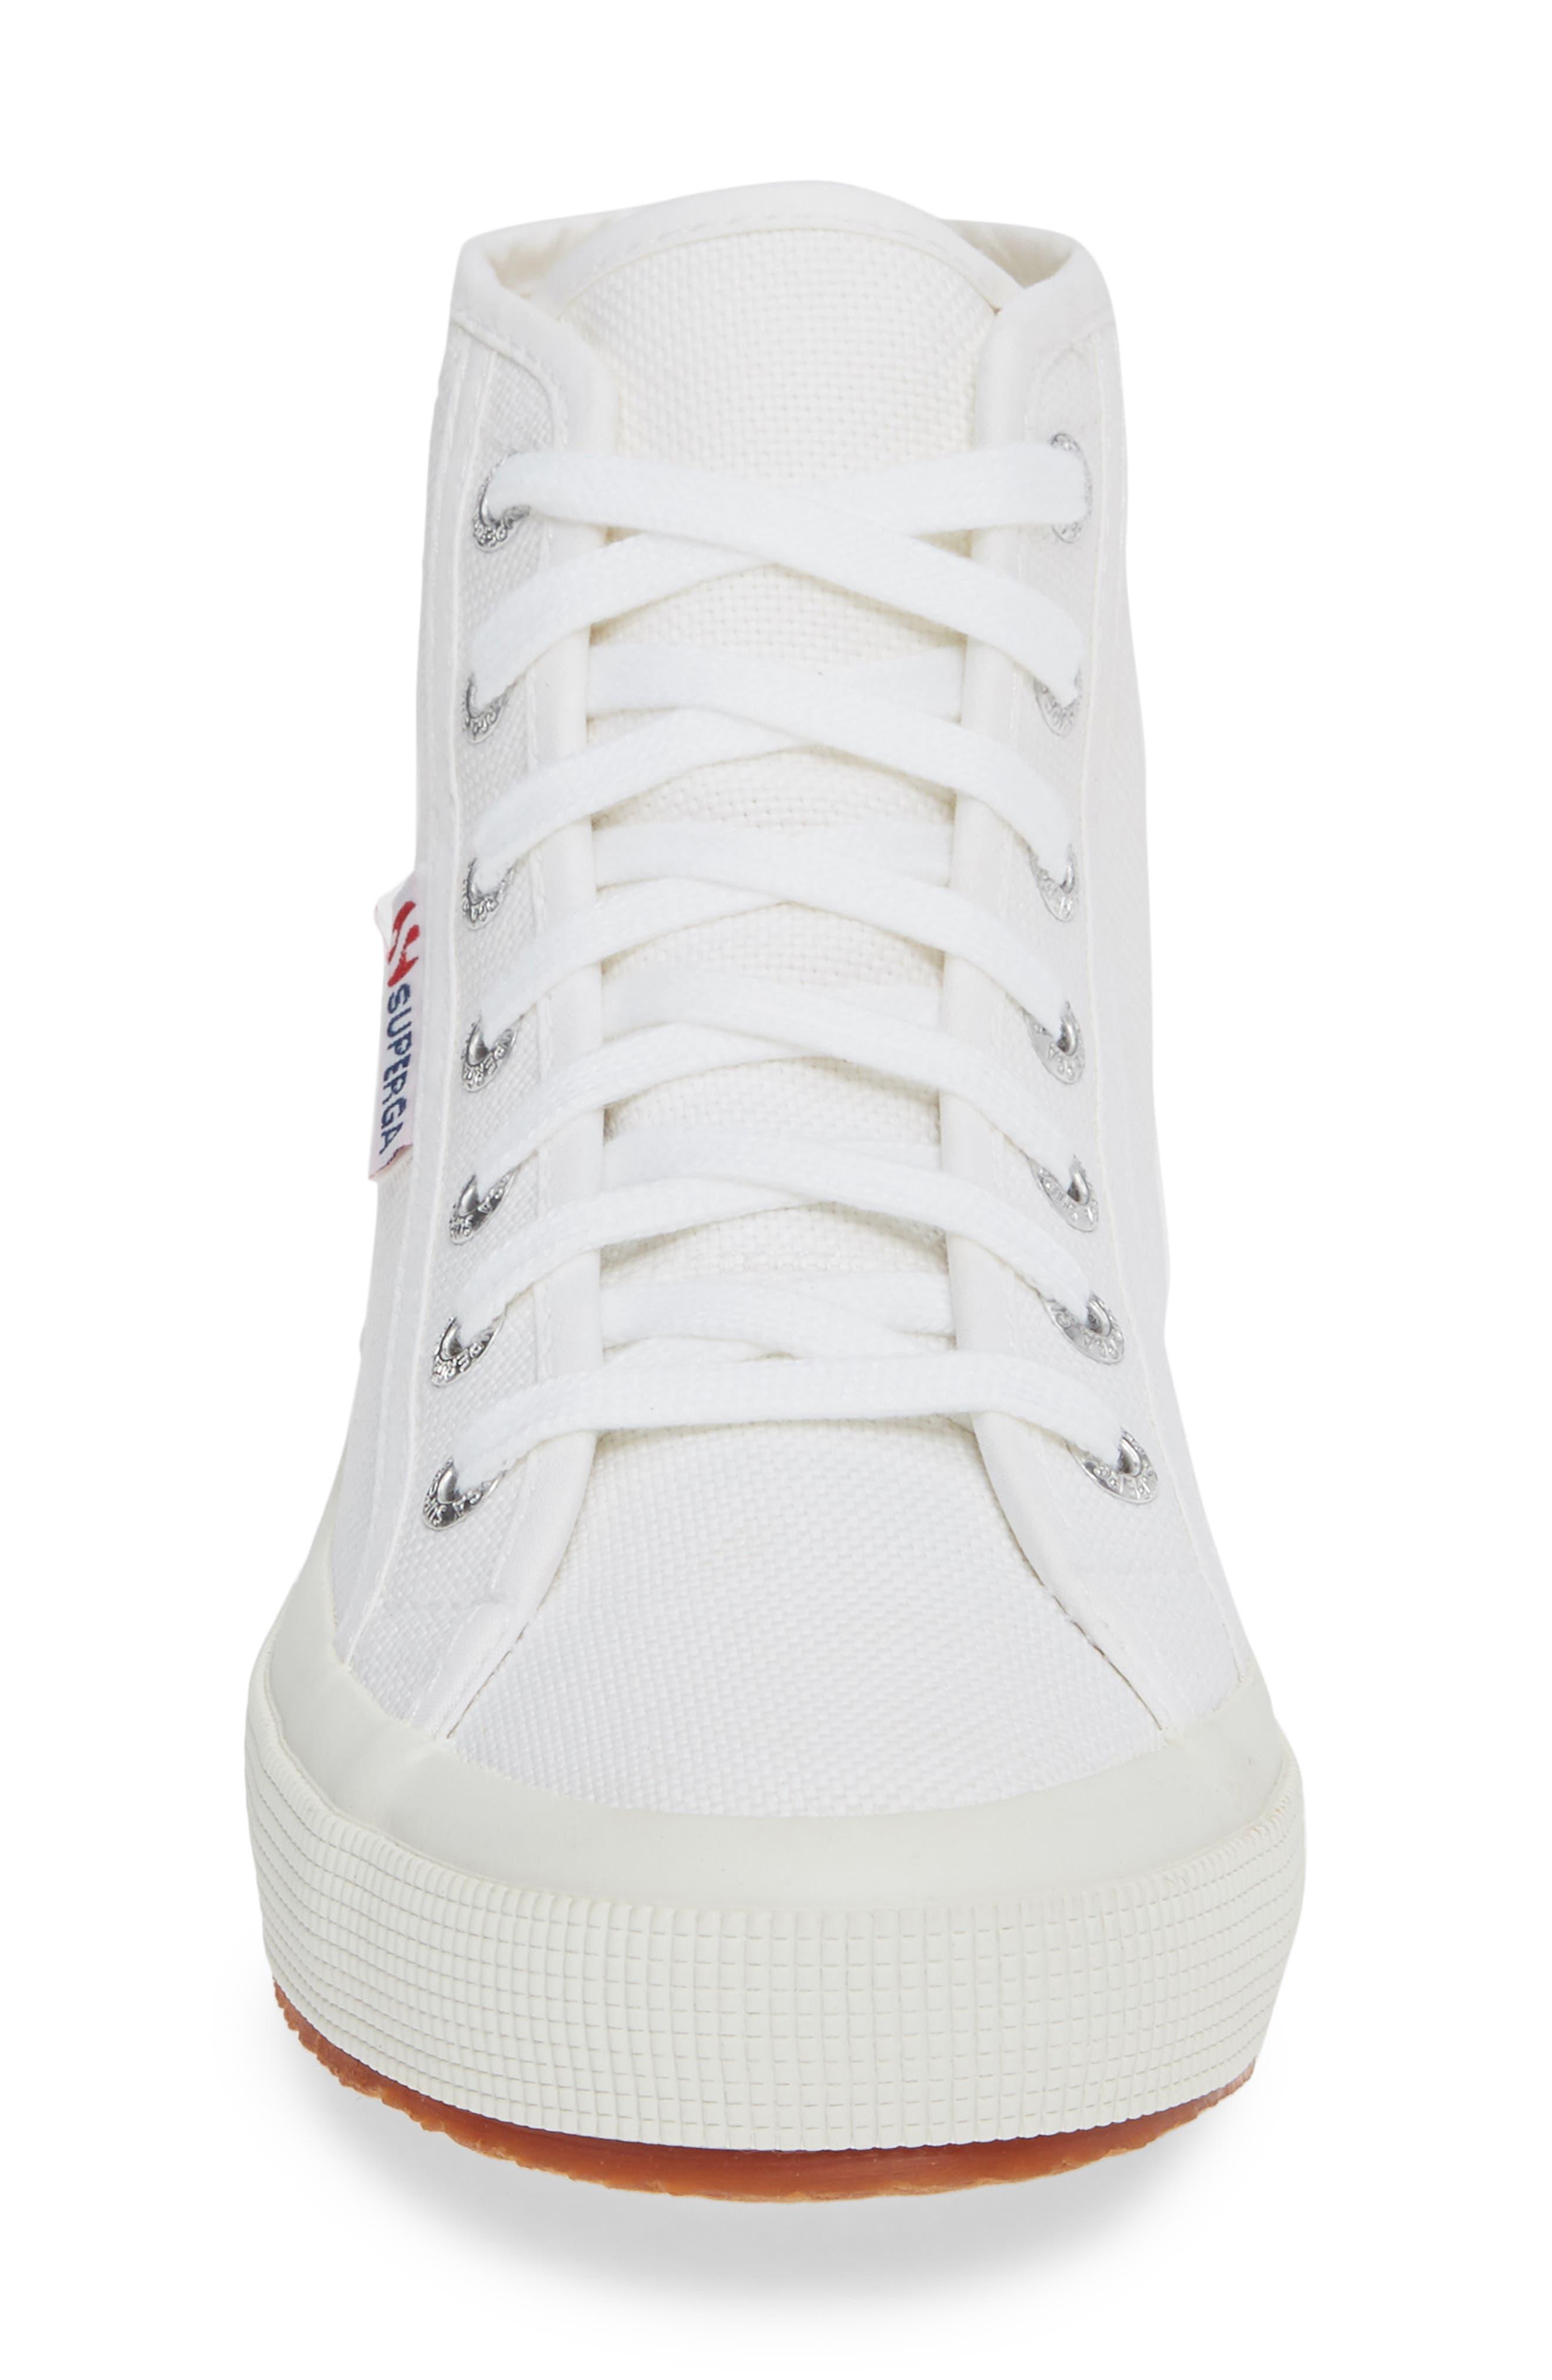 2795 High Top Sneaker,                             Alternate thumbnail 4, color,                             WHITE